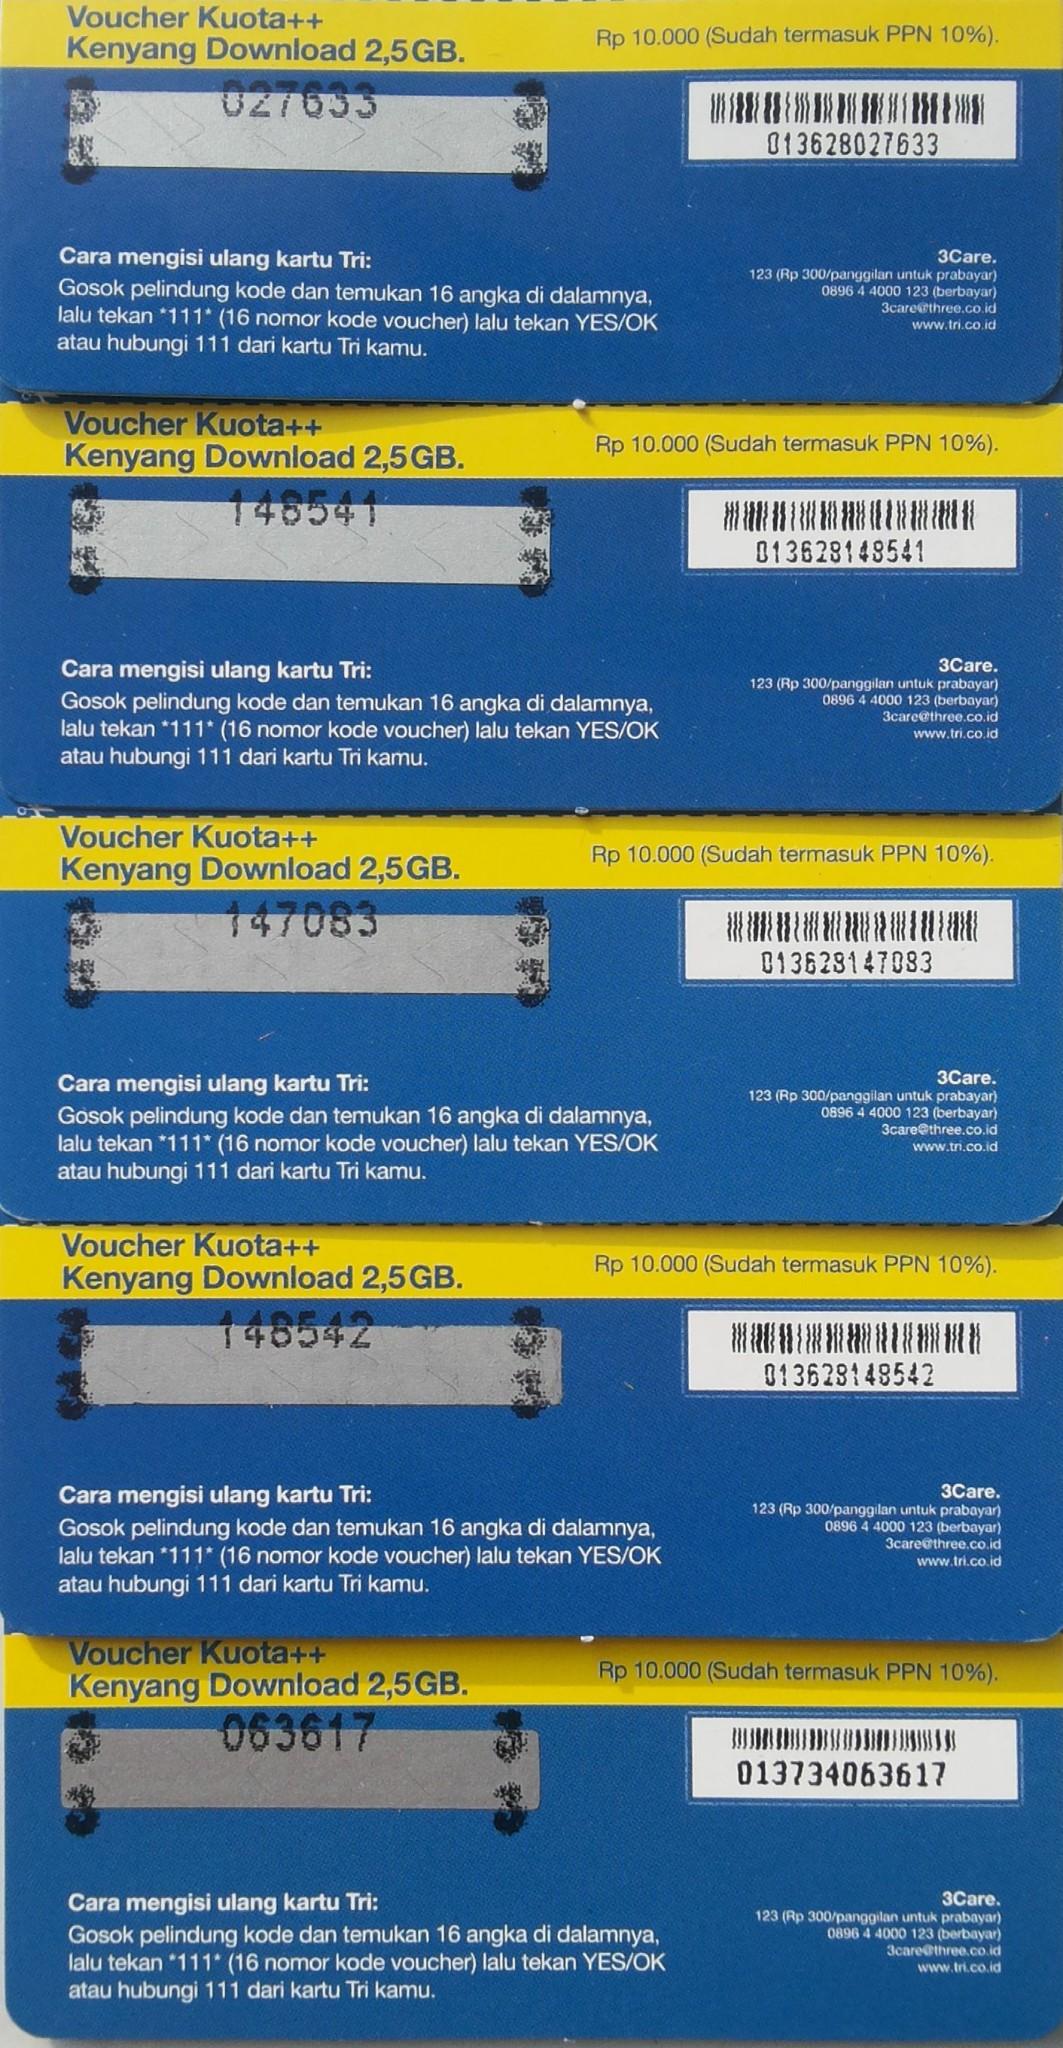 Tri Kuota 2 25gb Daftar Harga Terupdate Indonesia Kartu Perdana Dan Paket Data Mix 225gb Jual Voucher 125gb Jadi Kendo Kenyang Download